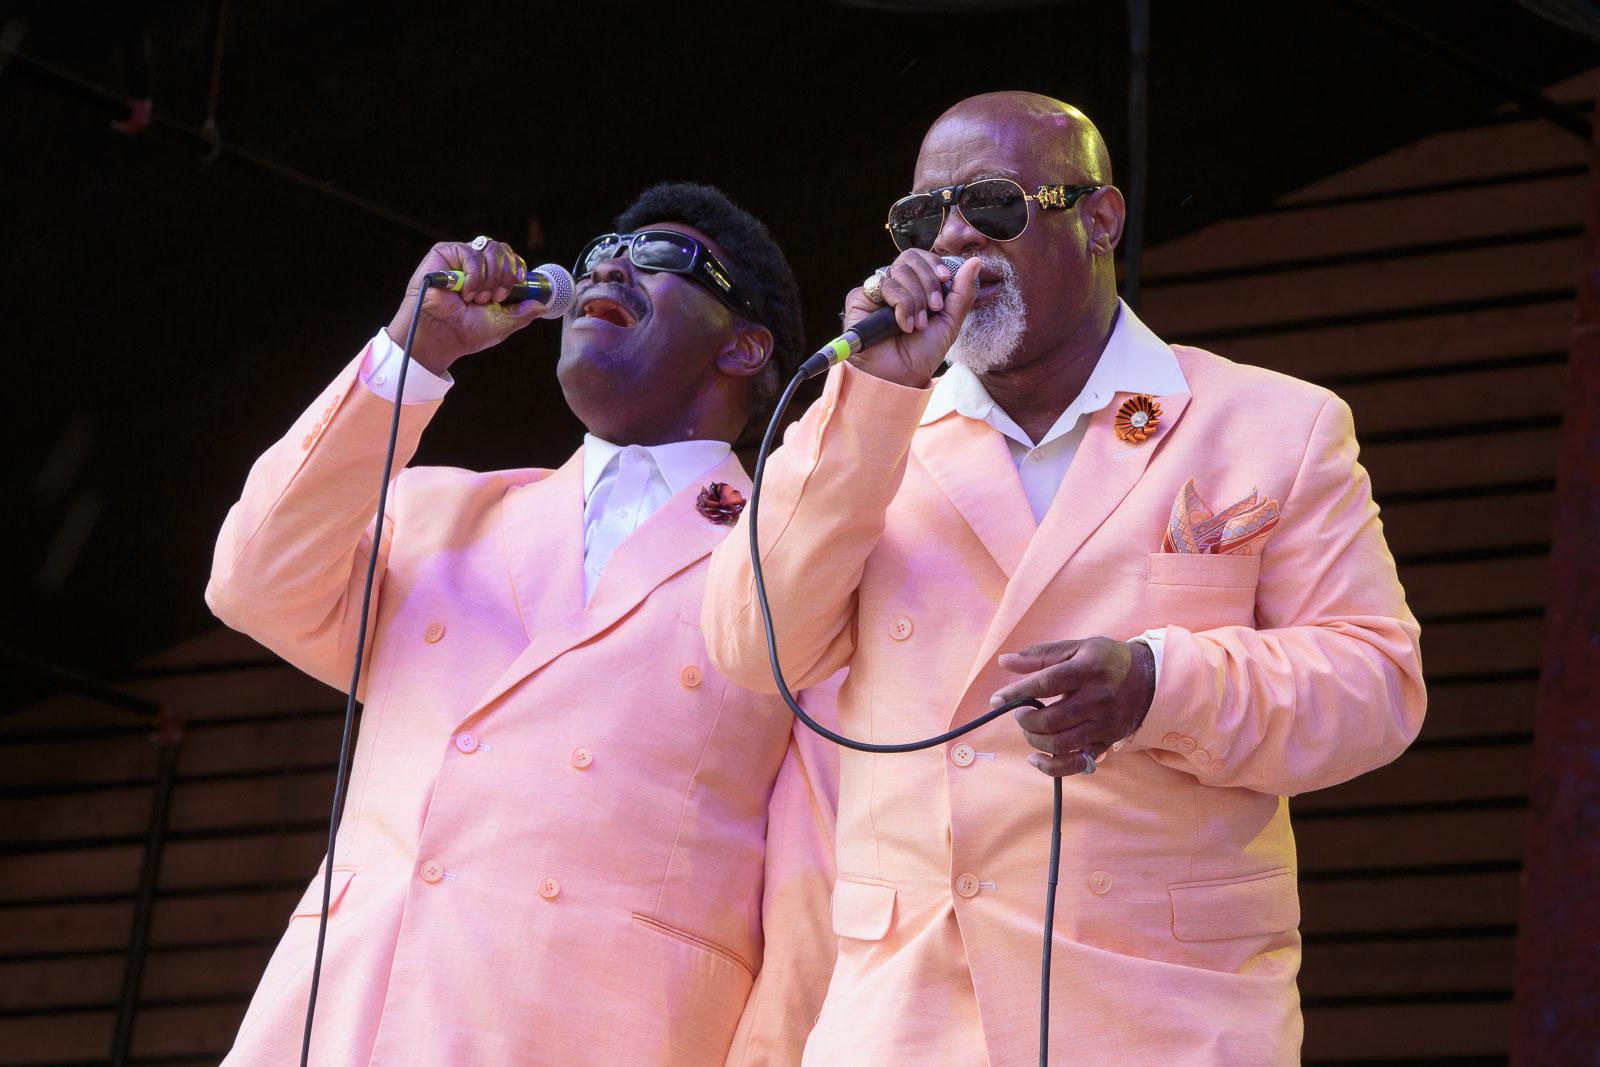 The-Blind-Boys-of-Alabama_BB_BLB23326.jpg